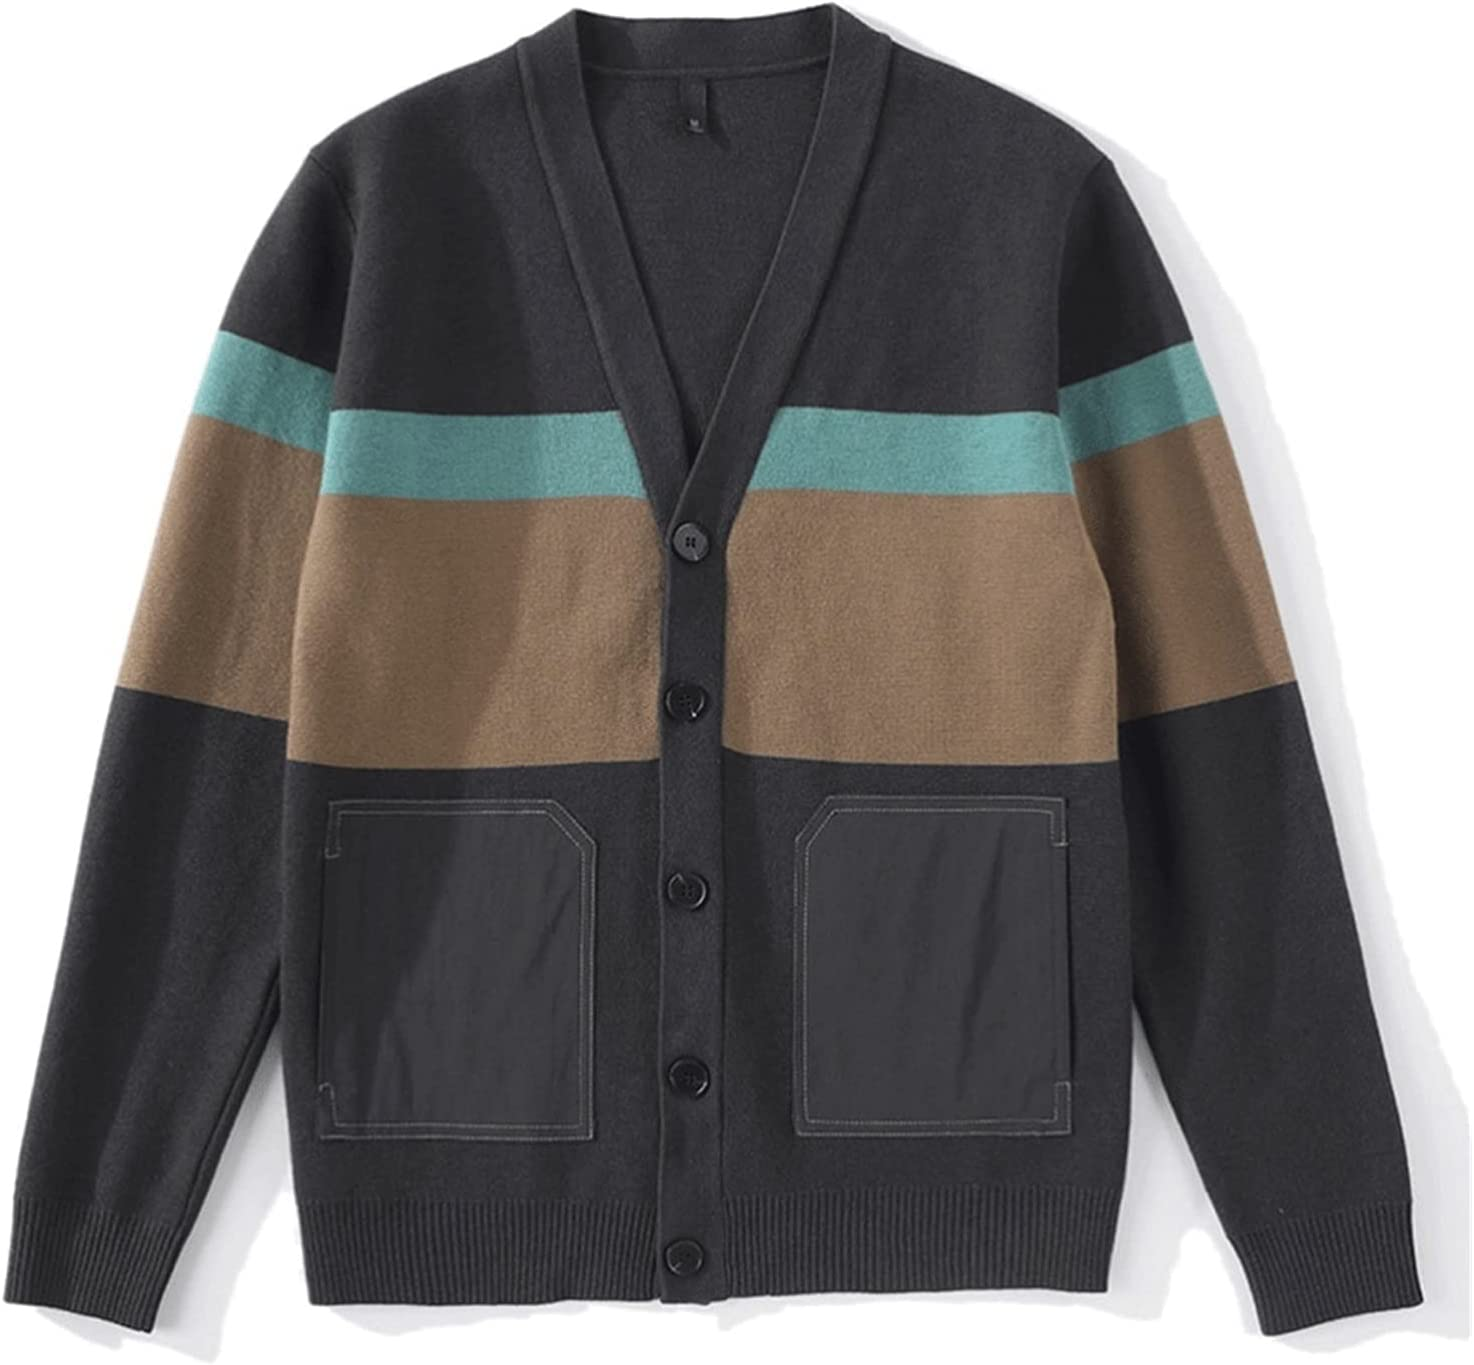 LSDJGDDE Autumn Men Casual Cardigan Sweater Striped Pockets Knit Outwear Sweater Men (Color : Gray, Size : XXL Code)